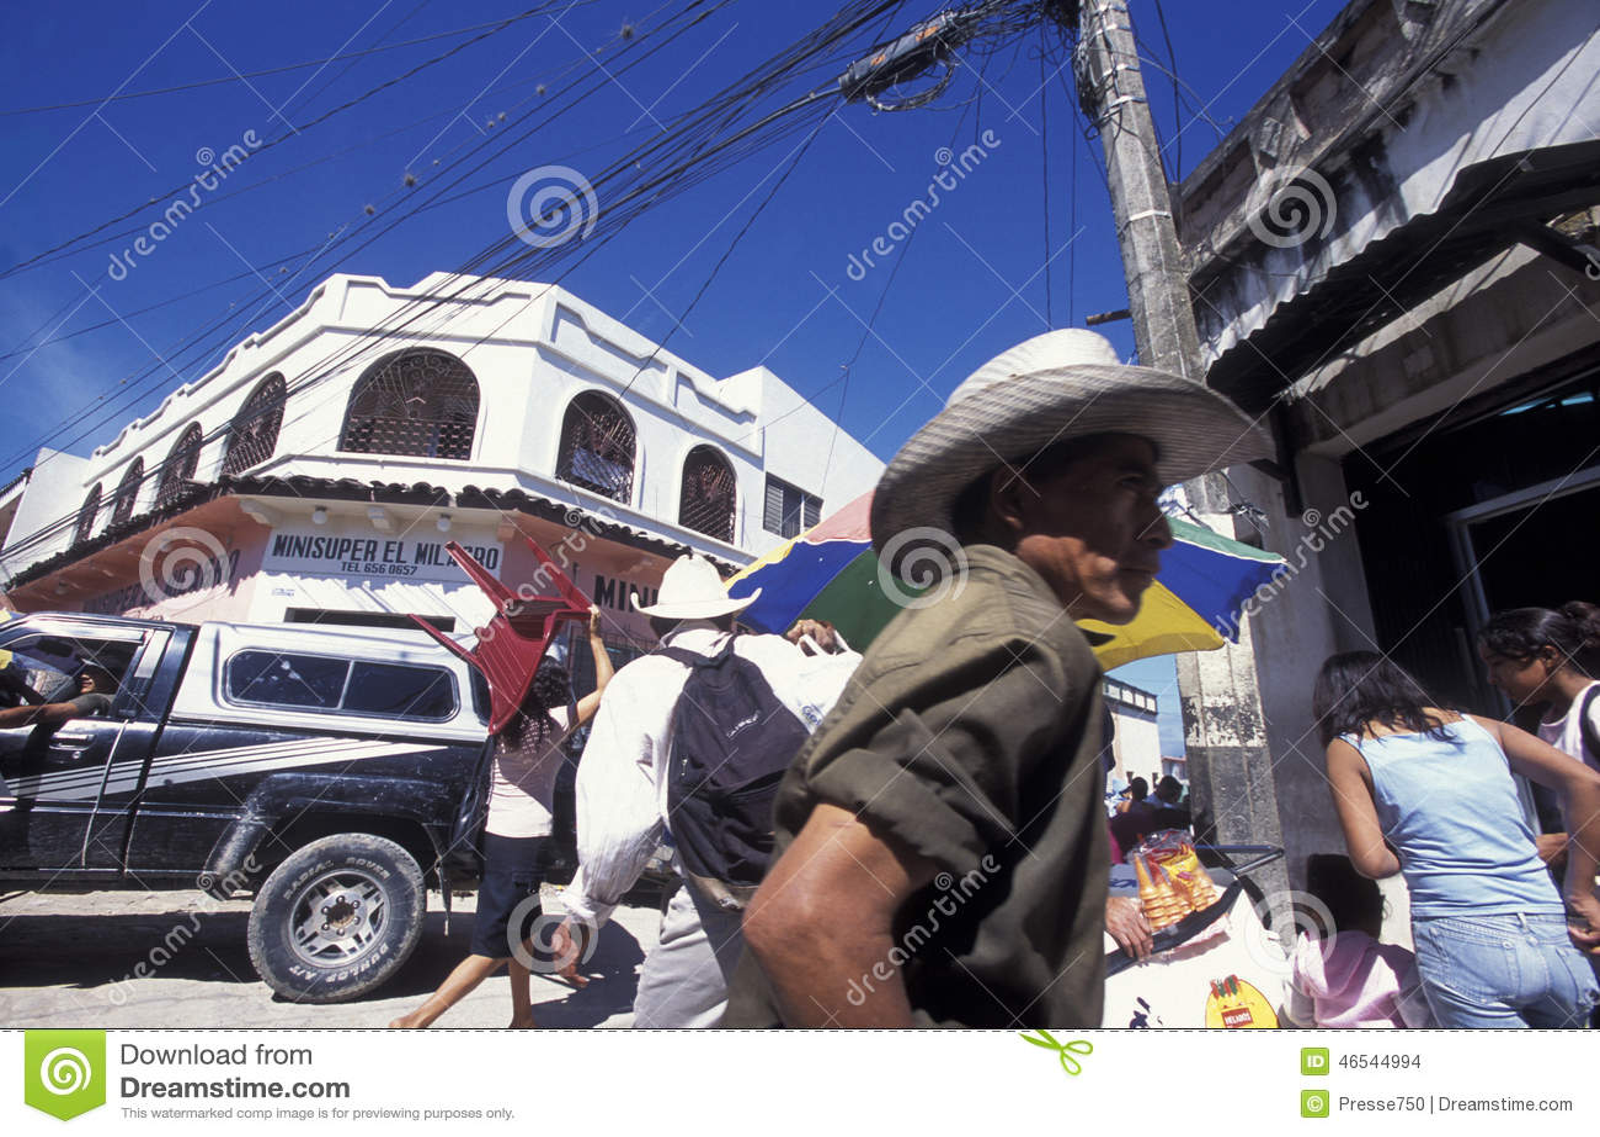 LATIN AMERICA HONDURAS SAN PEDRO SULA